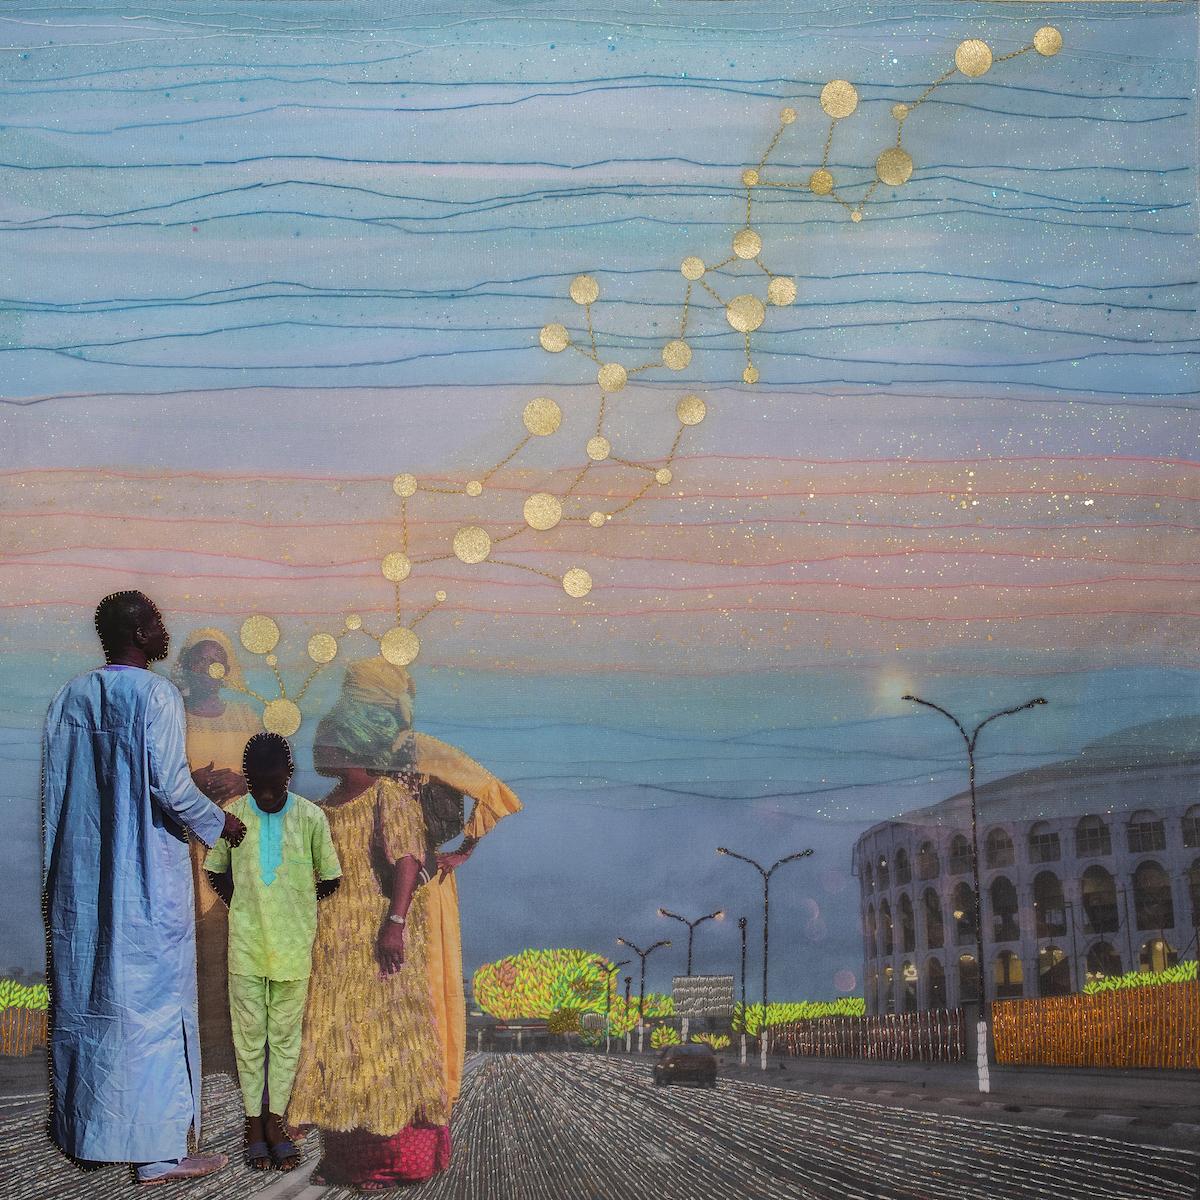 Joana Choumali, Dream Leftovers, Series Albahian, 2019.